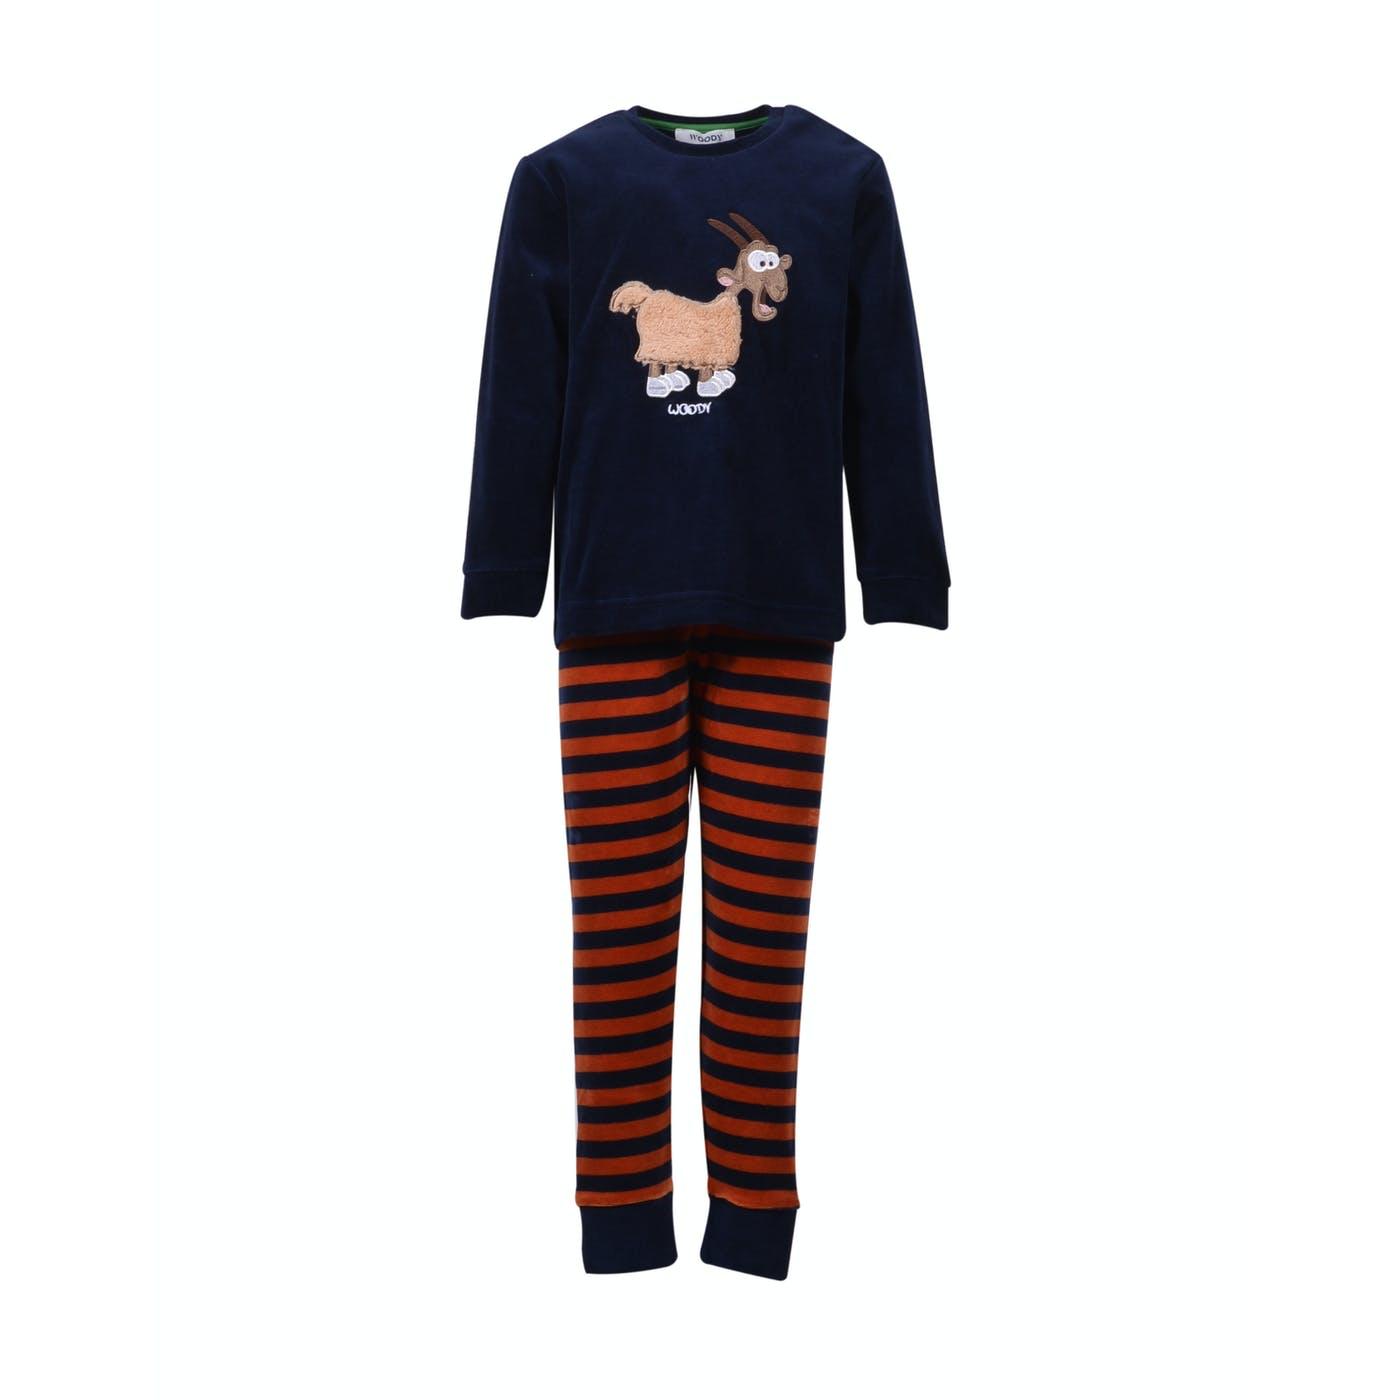 Woody Jongens-Heren pyjama, thema geit